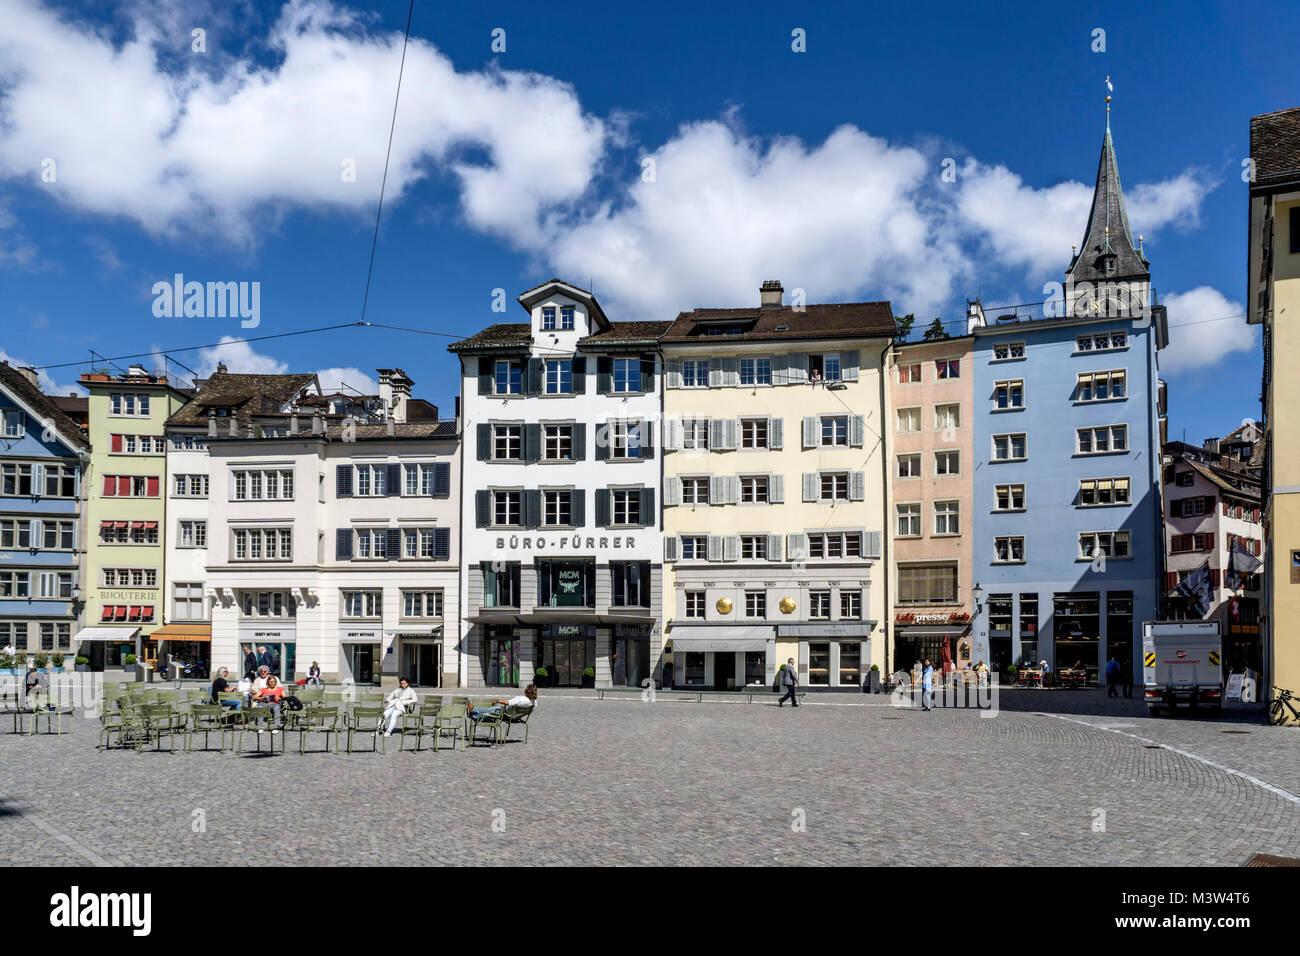 Münsterplatz, Altstadtfassaden, St. Peterskirche, Zürich, Schweiz | Munster Square, Old City Center, st. Stockbild